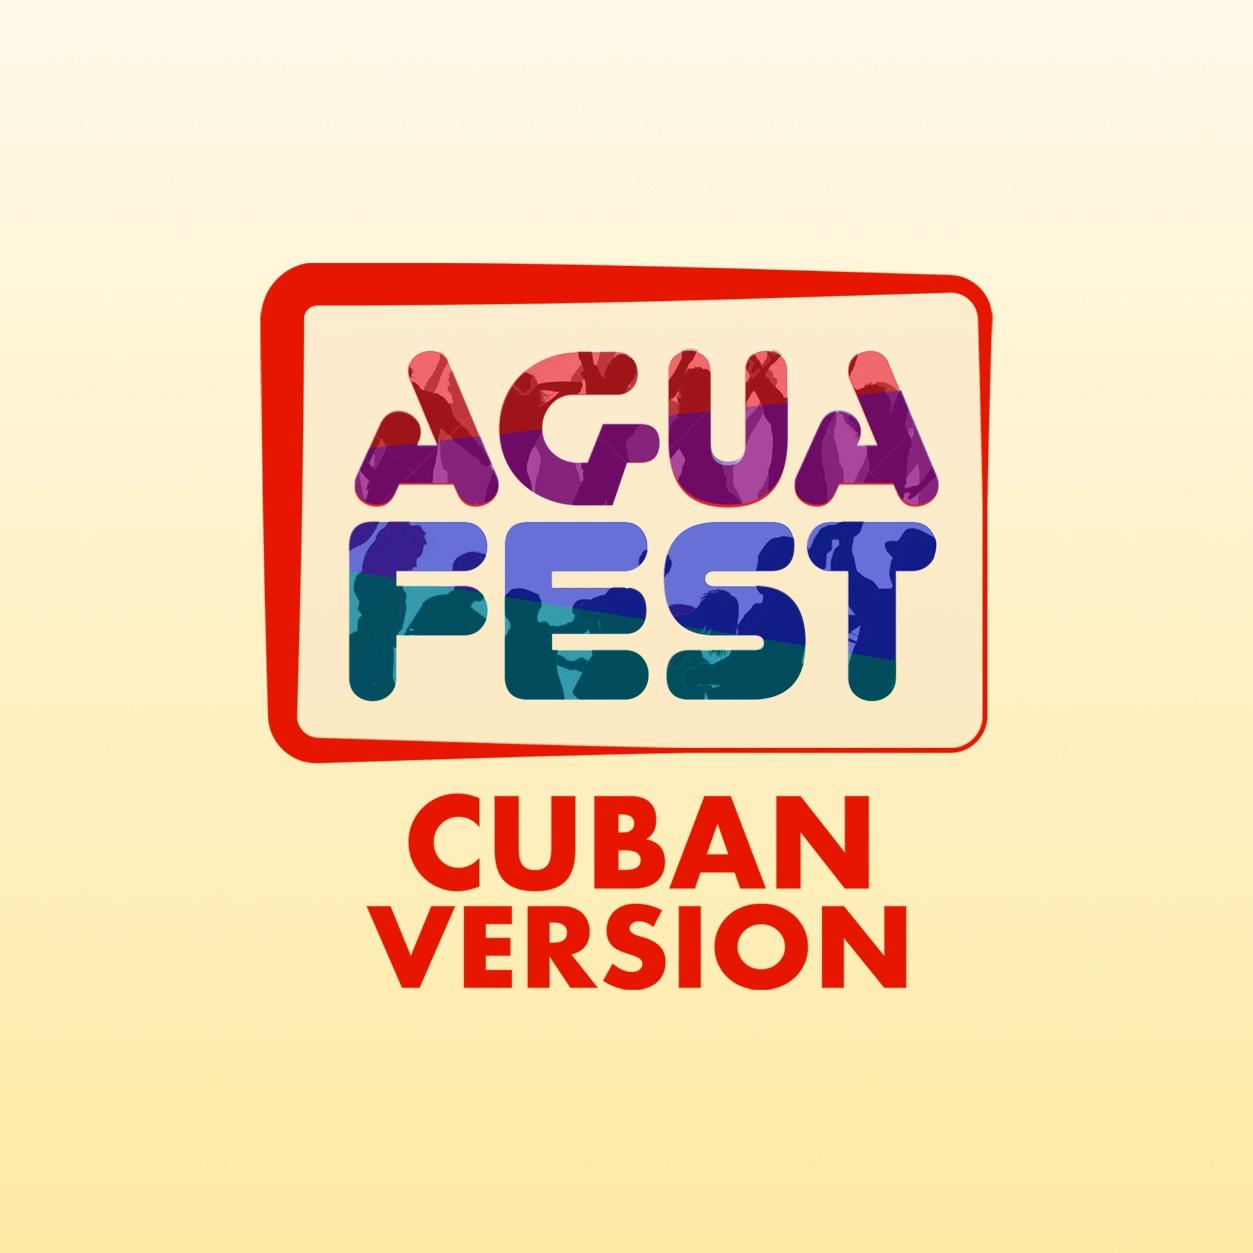 Афиша Самара AguaFest CUBAN VERSION 11-14 июня Самара